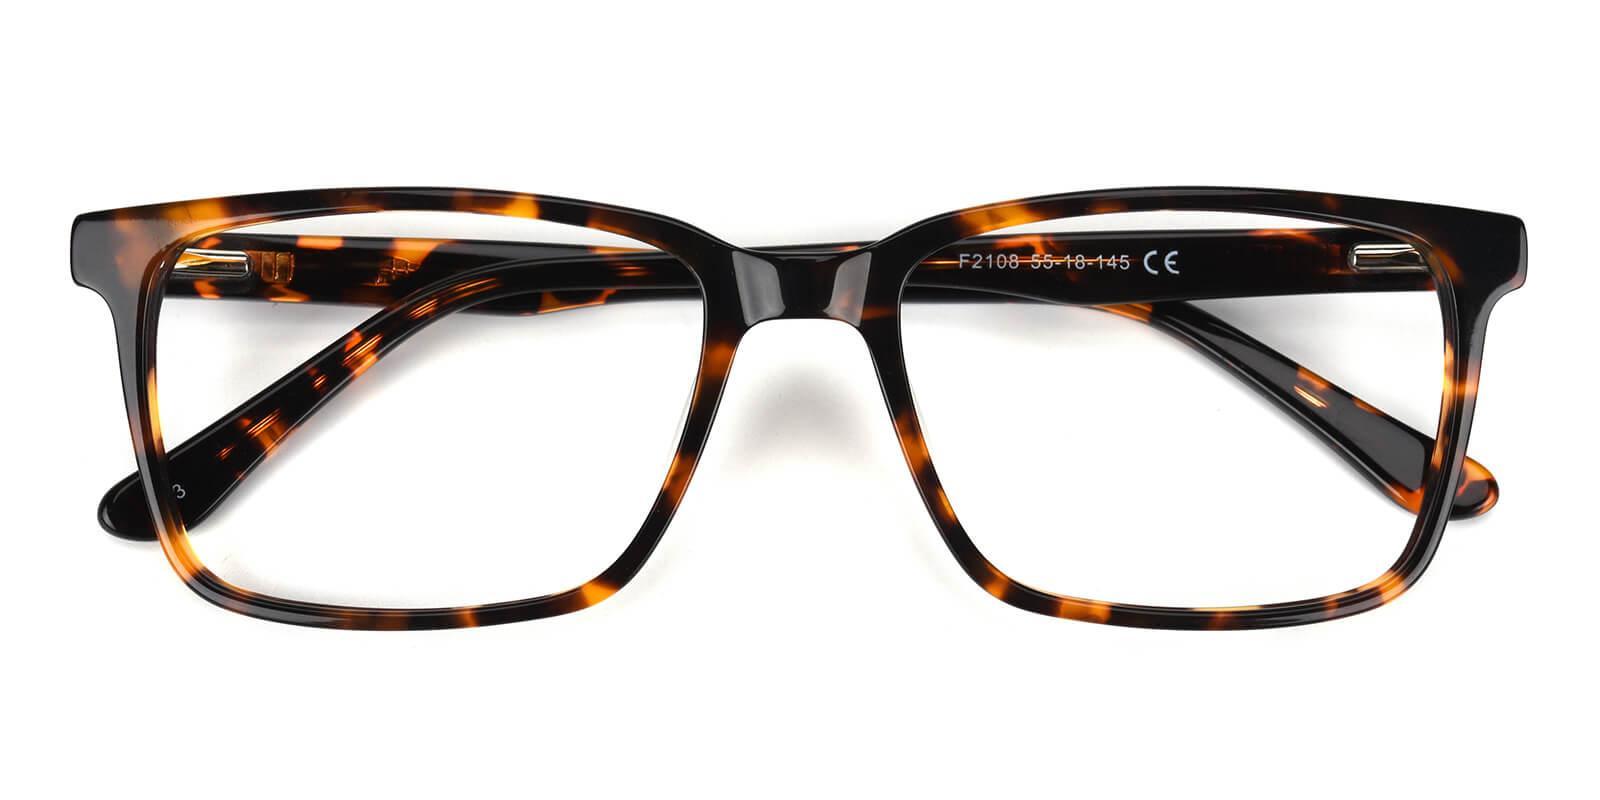 Sakou-Tortoise-Square-Acetate-Eyeglasses-detail